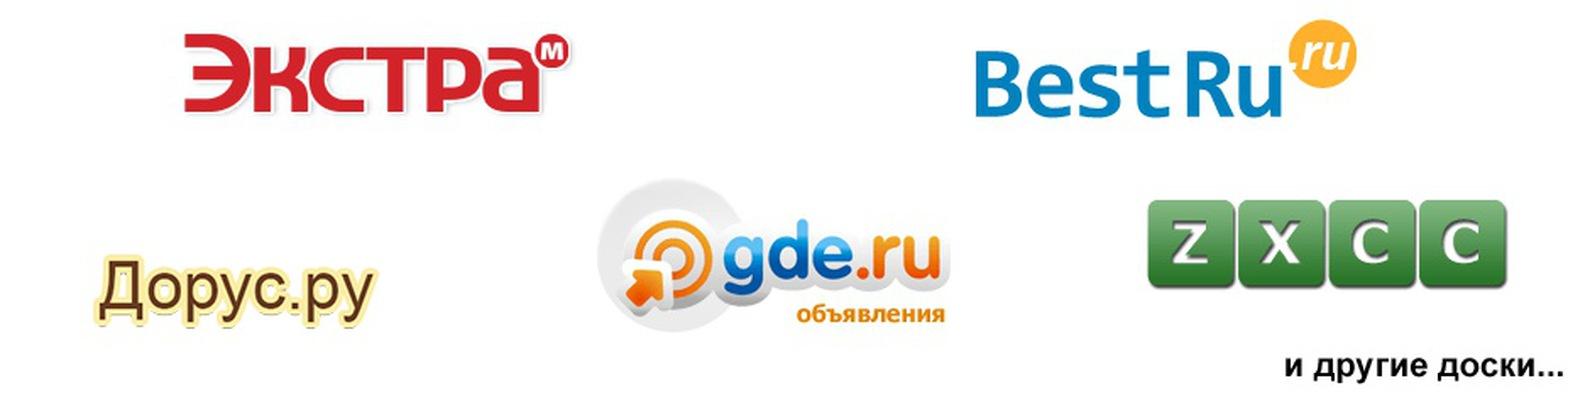 3f5dd8f96ec9 Po-Doskam.ru - Ручное размещение объявлений   ВКонтакте